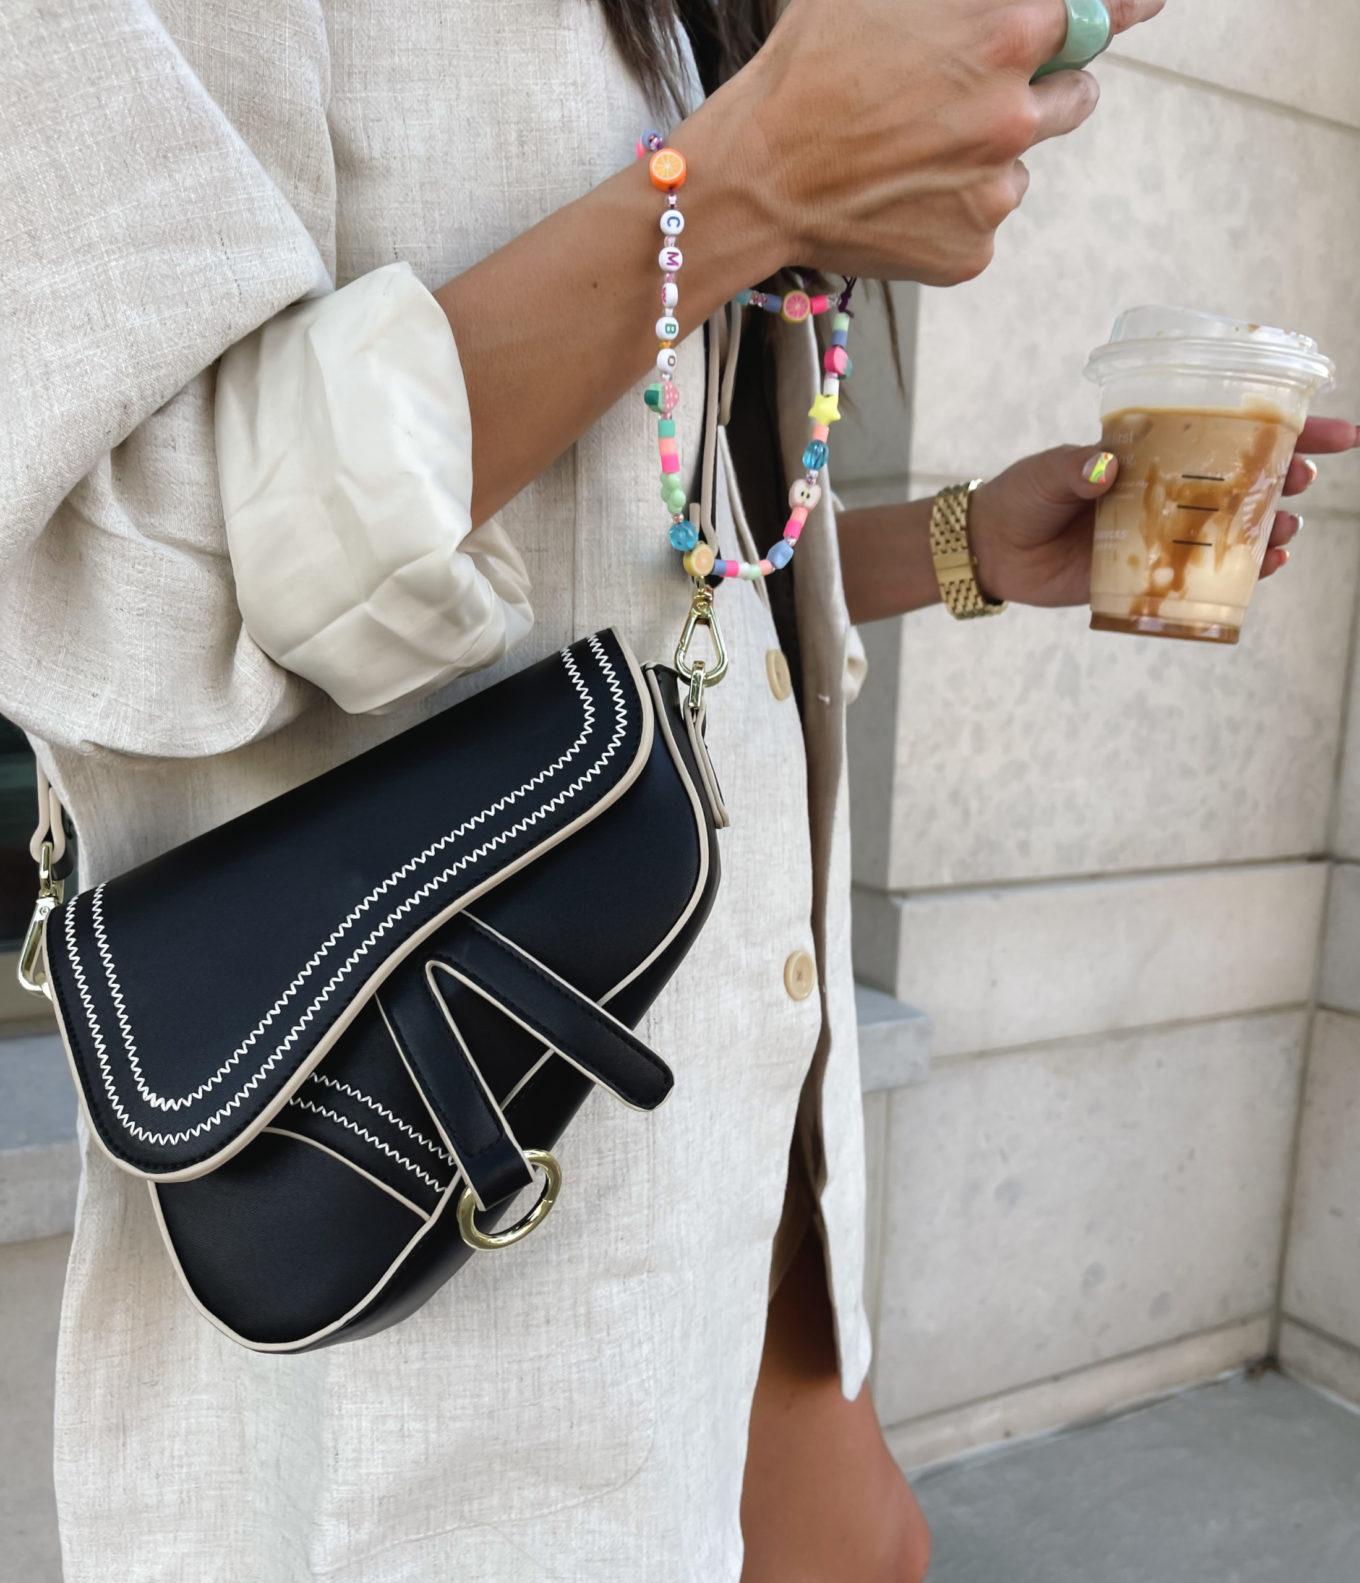 dior look alike handbags